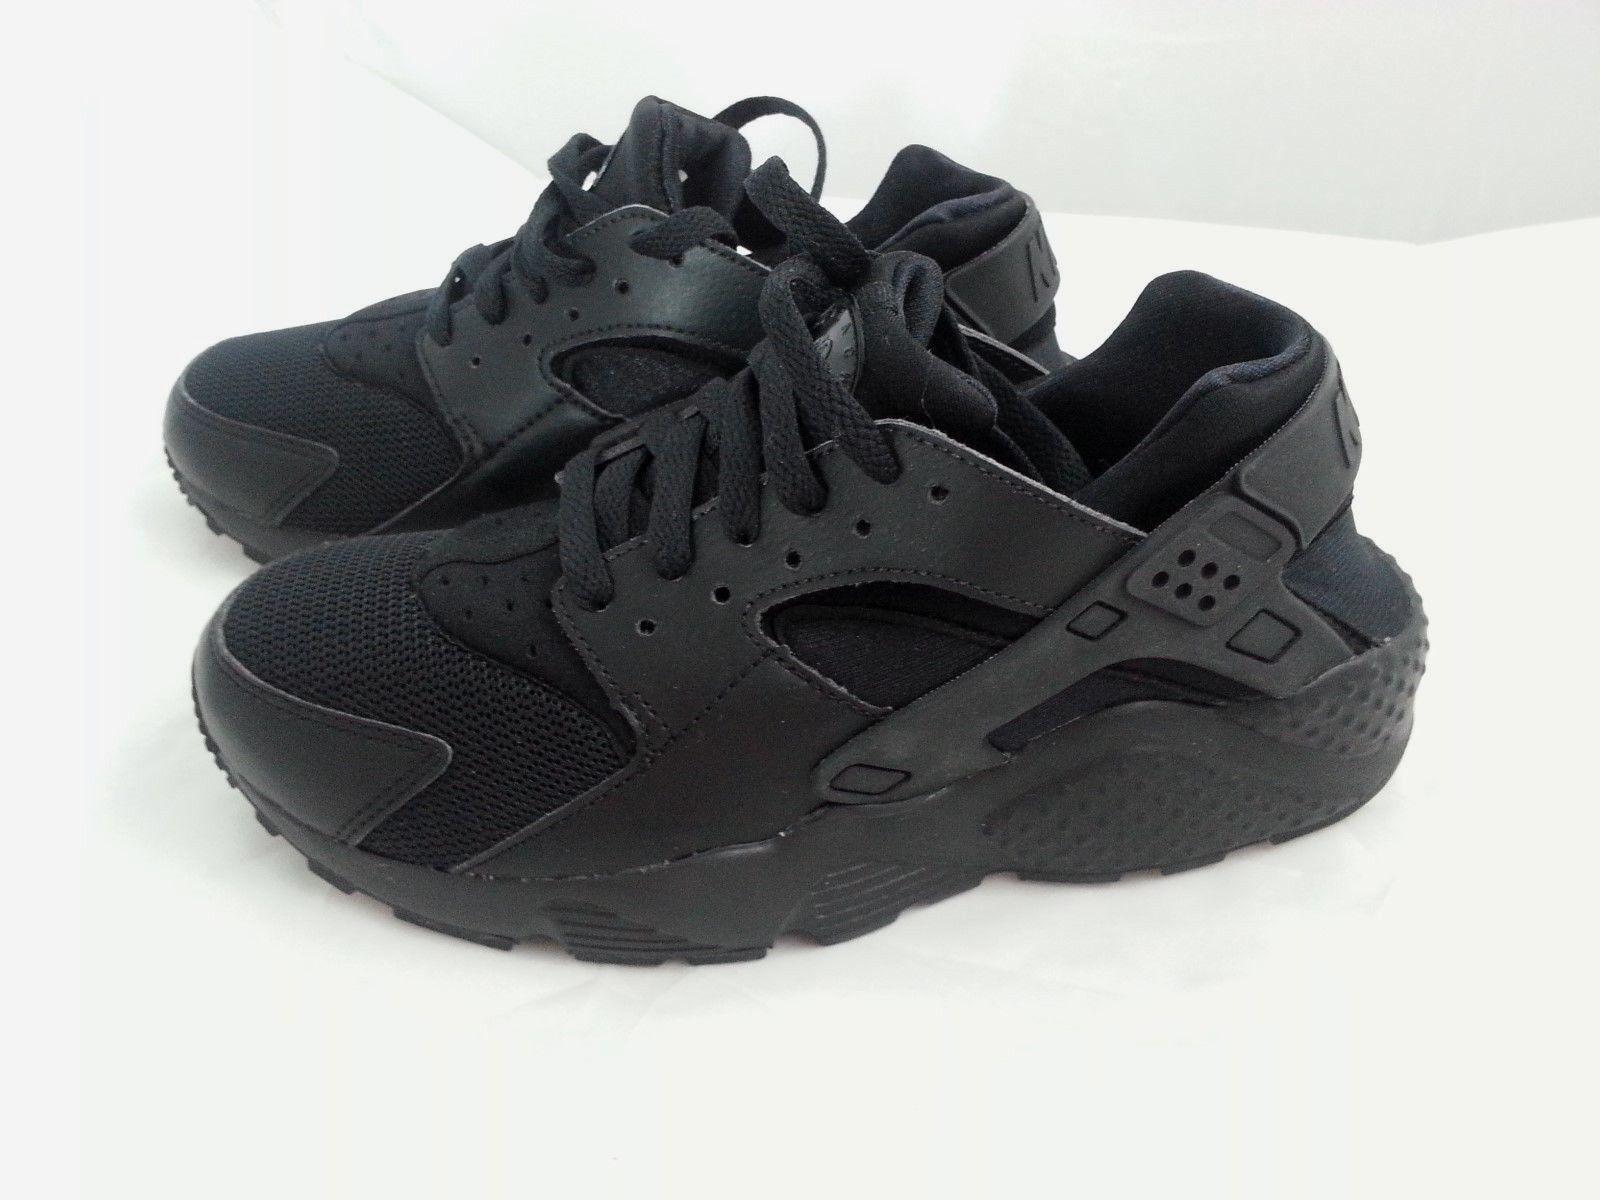 Nike schwarz Huarache Run Sneaker schwarz Nike Gr. 38,5 (UK 5,5) e5ae01